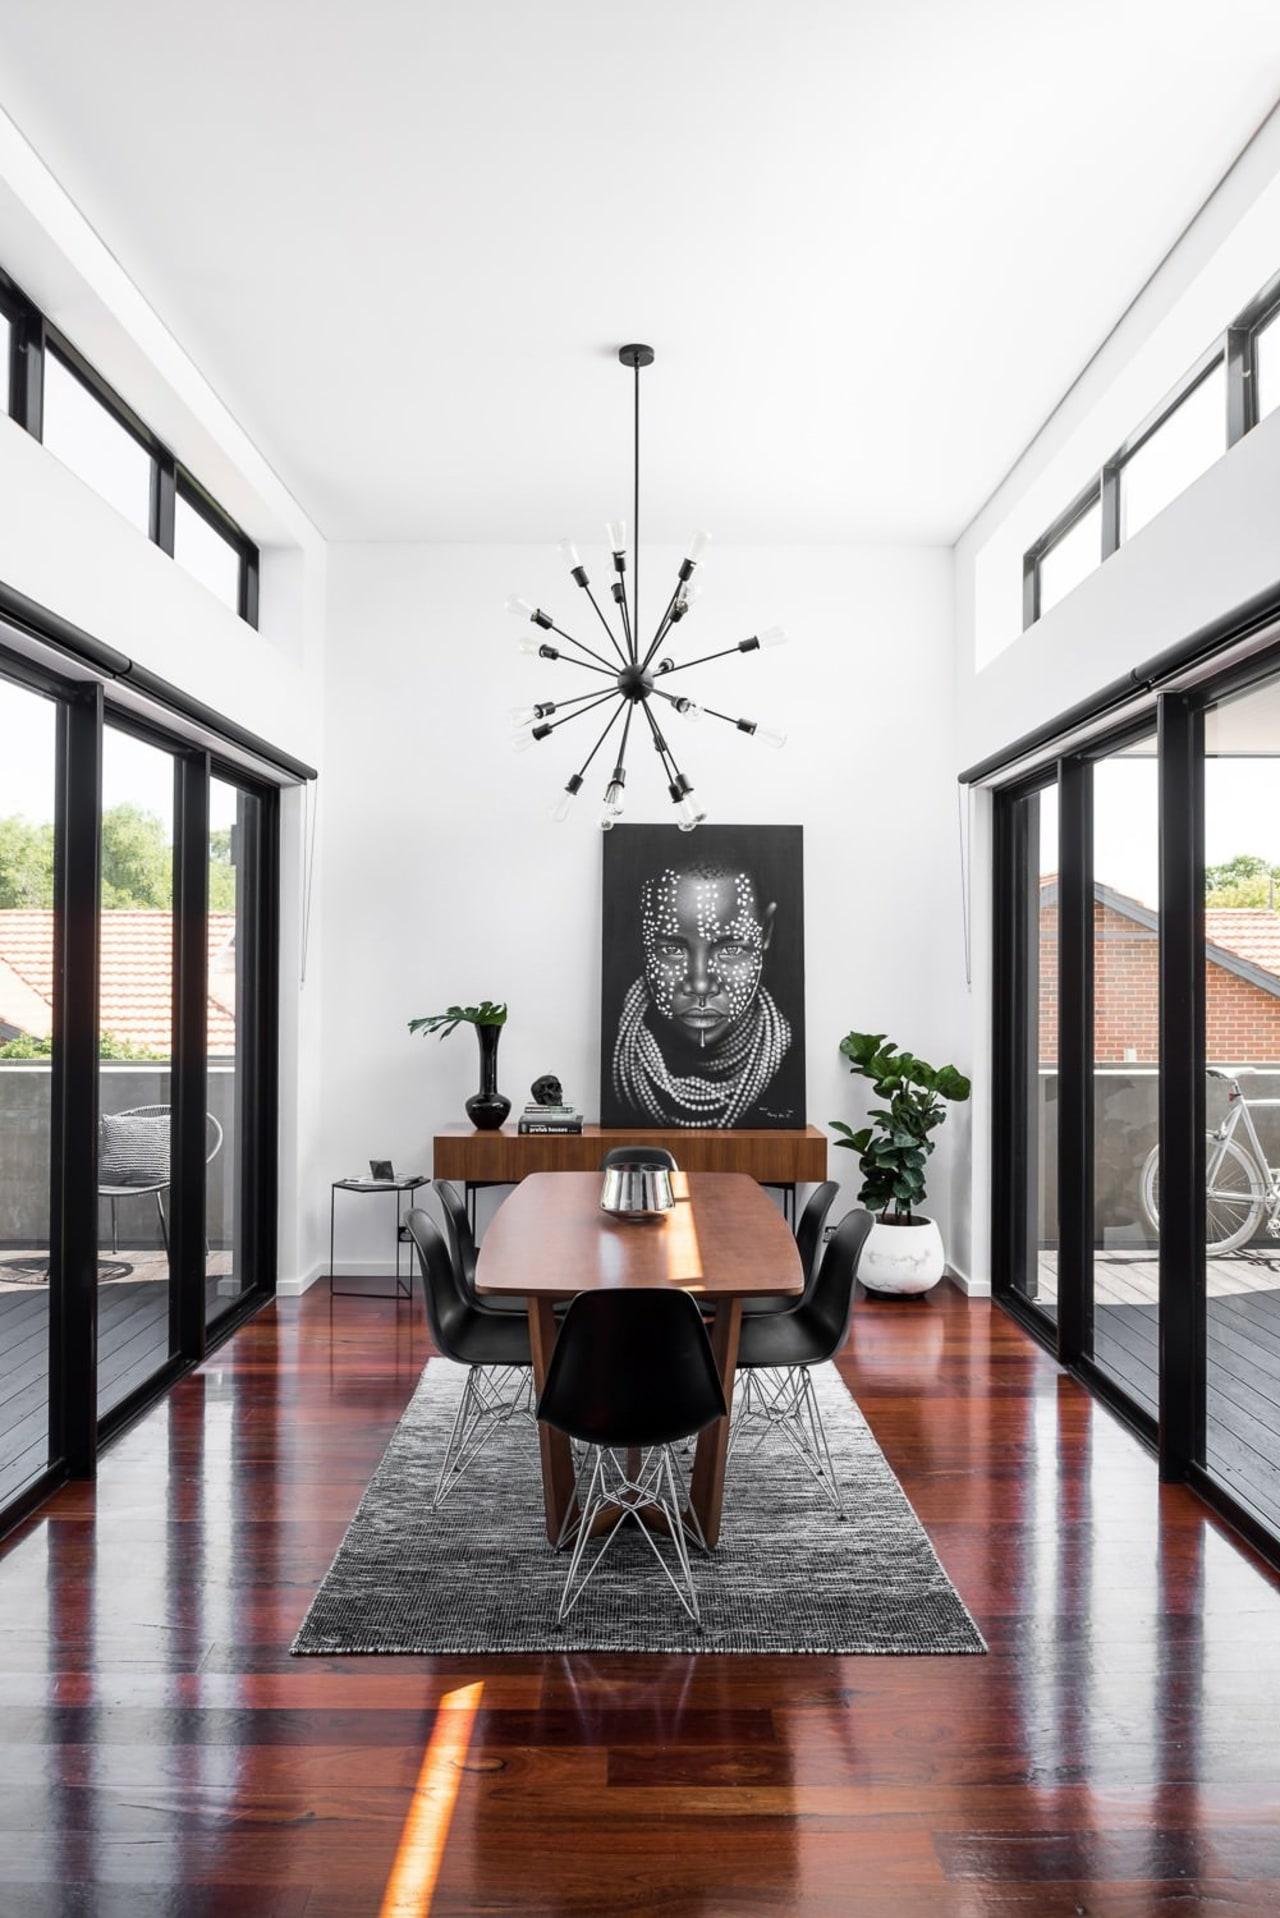 TIDA AU 2017 – Designer renovation winner – ceiling, dining room, floor, flooring, furniture, hardwood, interior design, living room, room, table, wood flooring, white